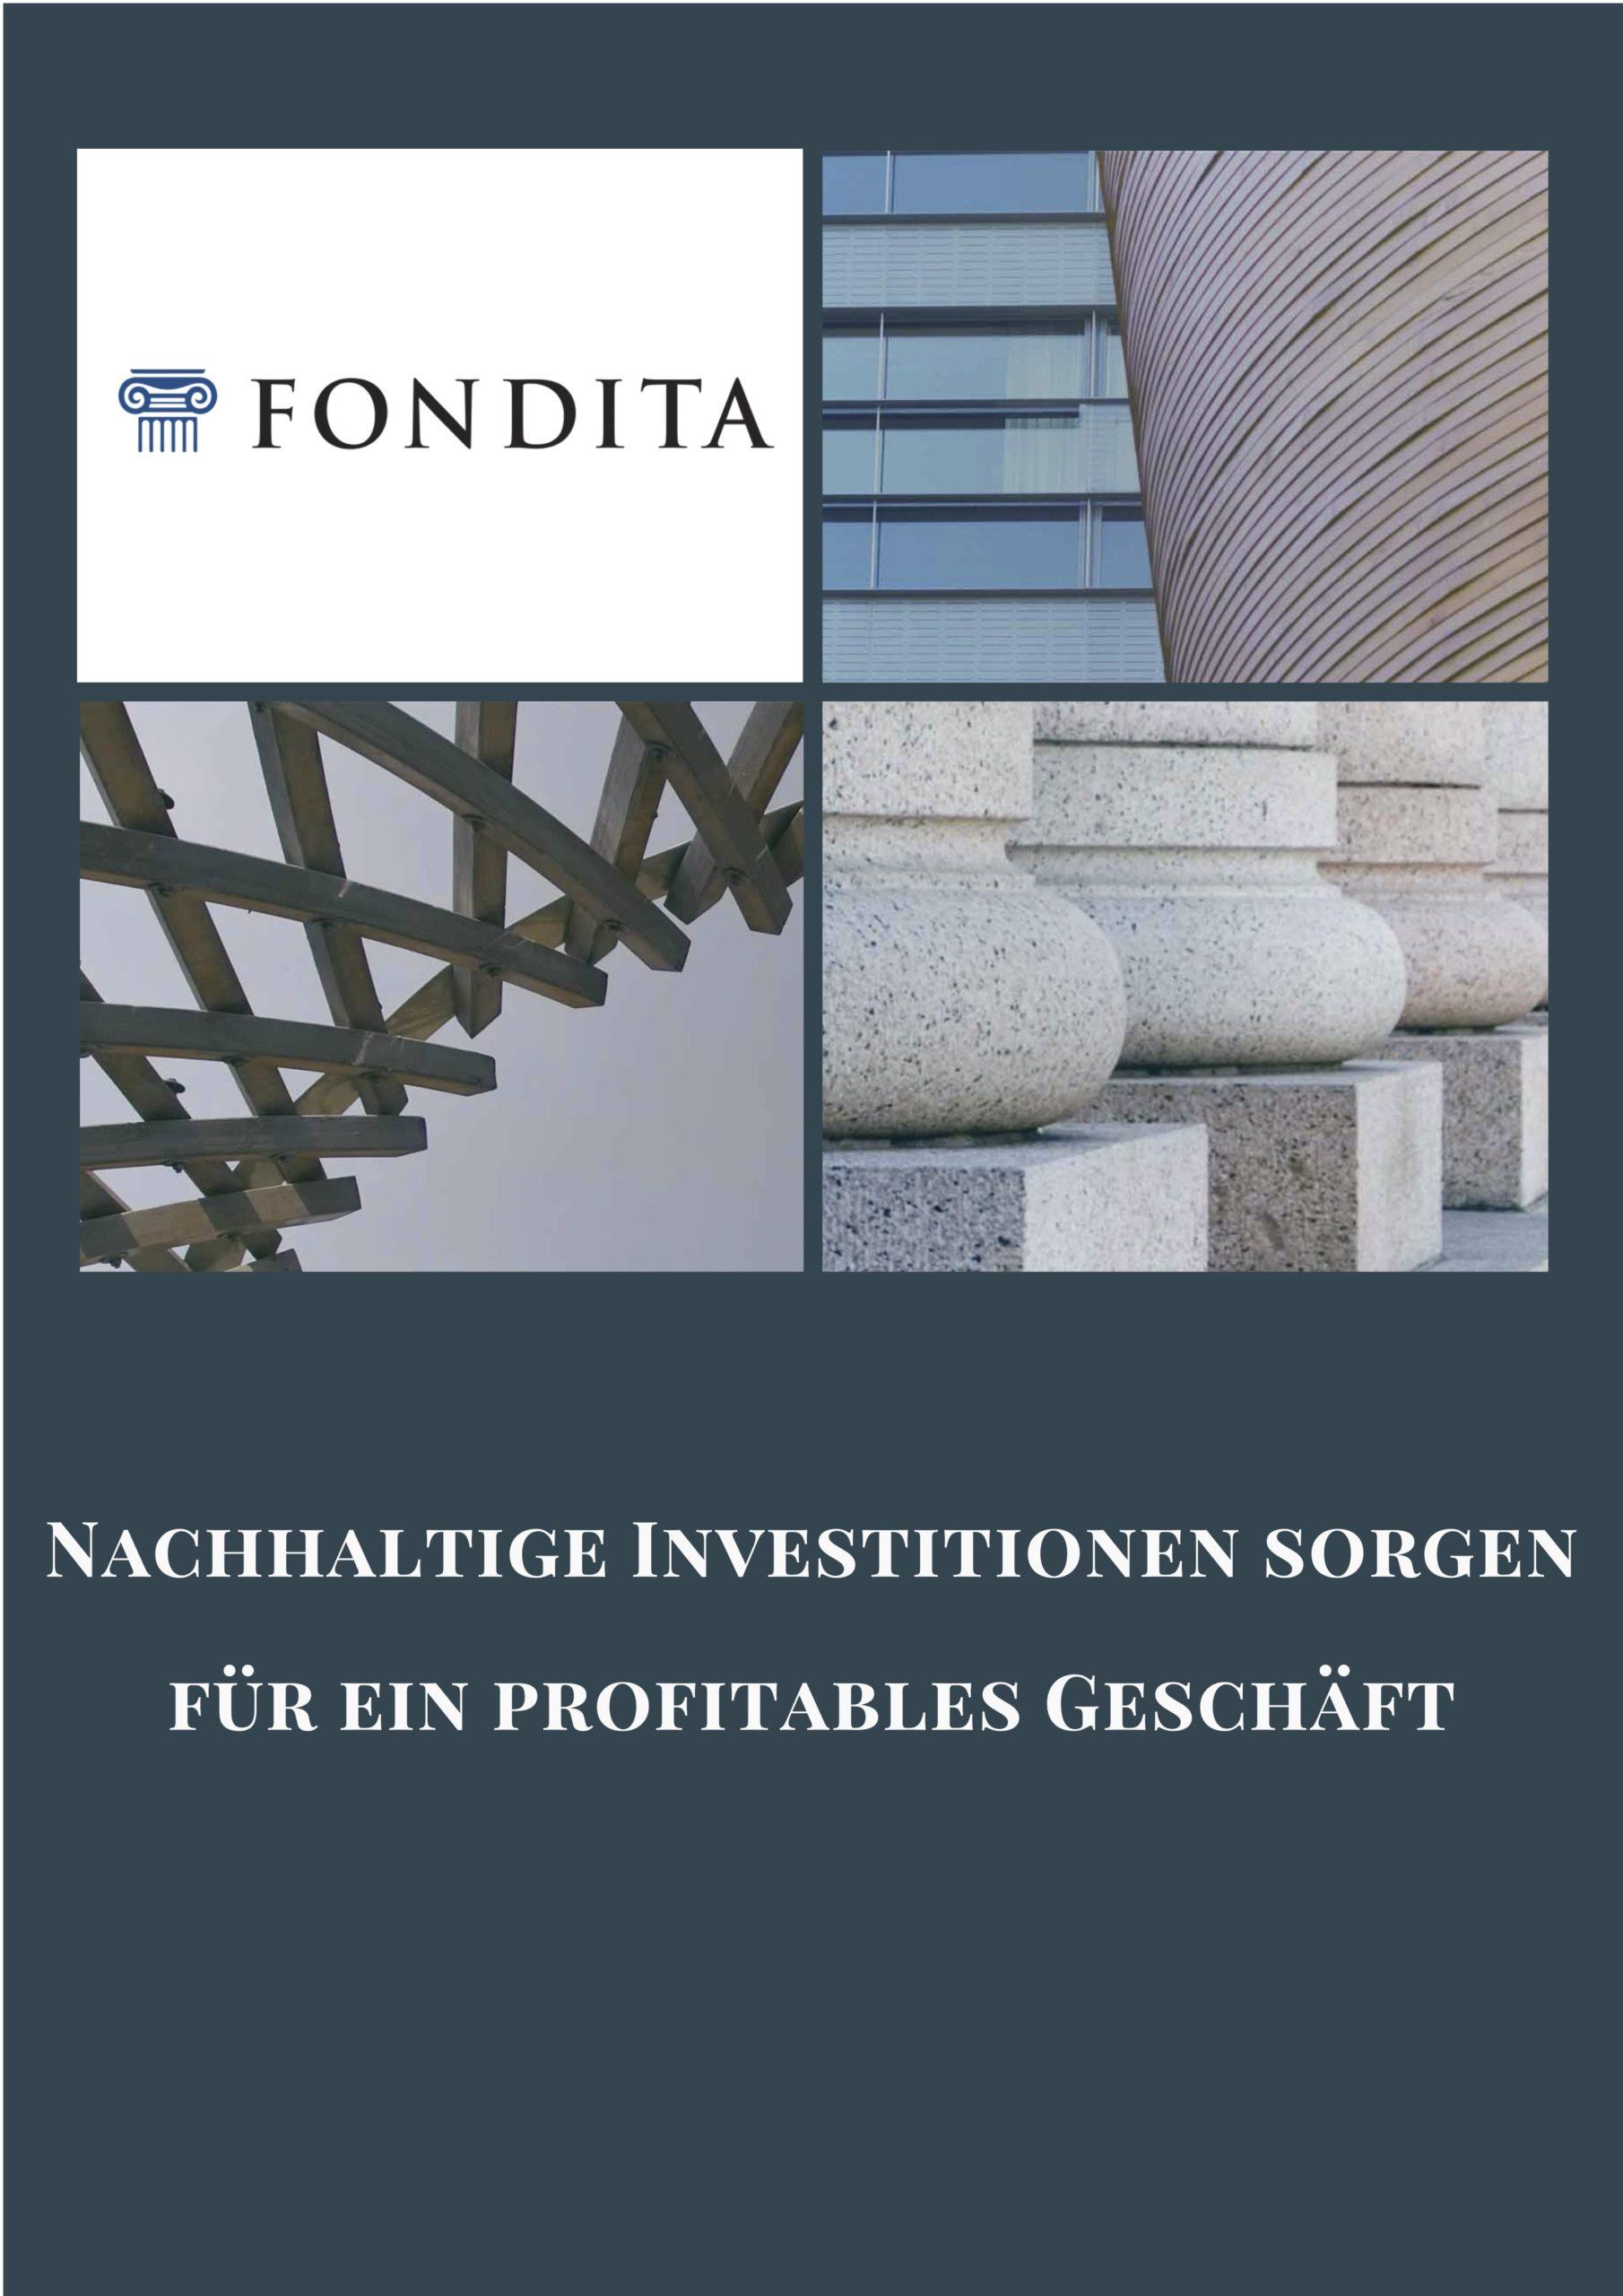 https://ricinco.com/nachhaltige-investitionen-fondita